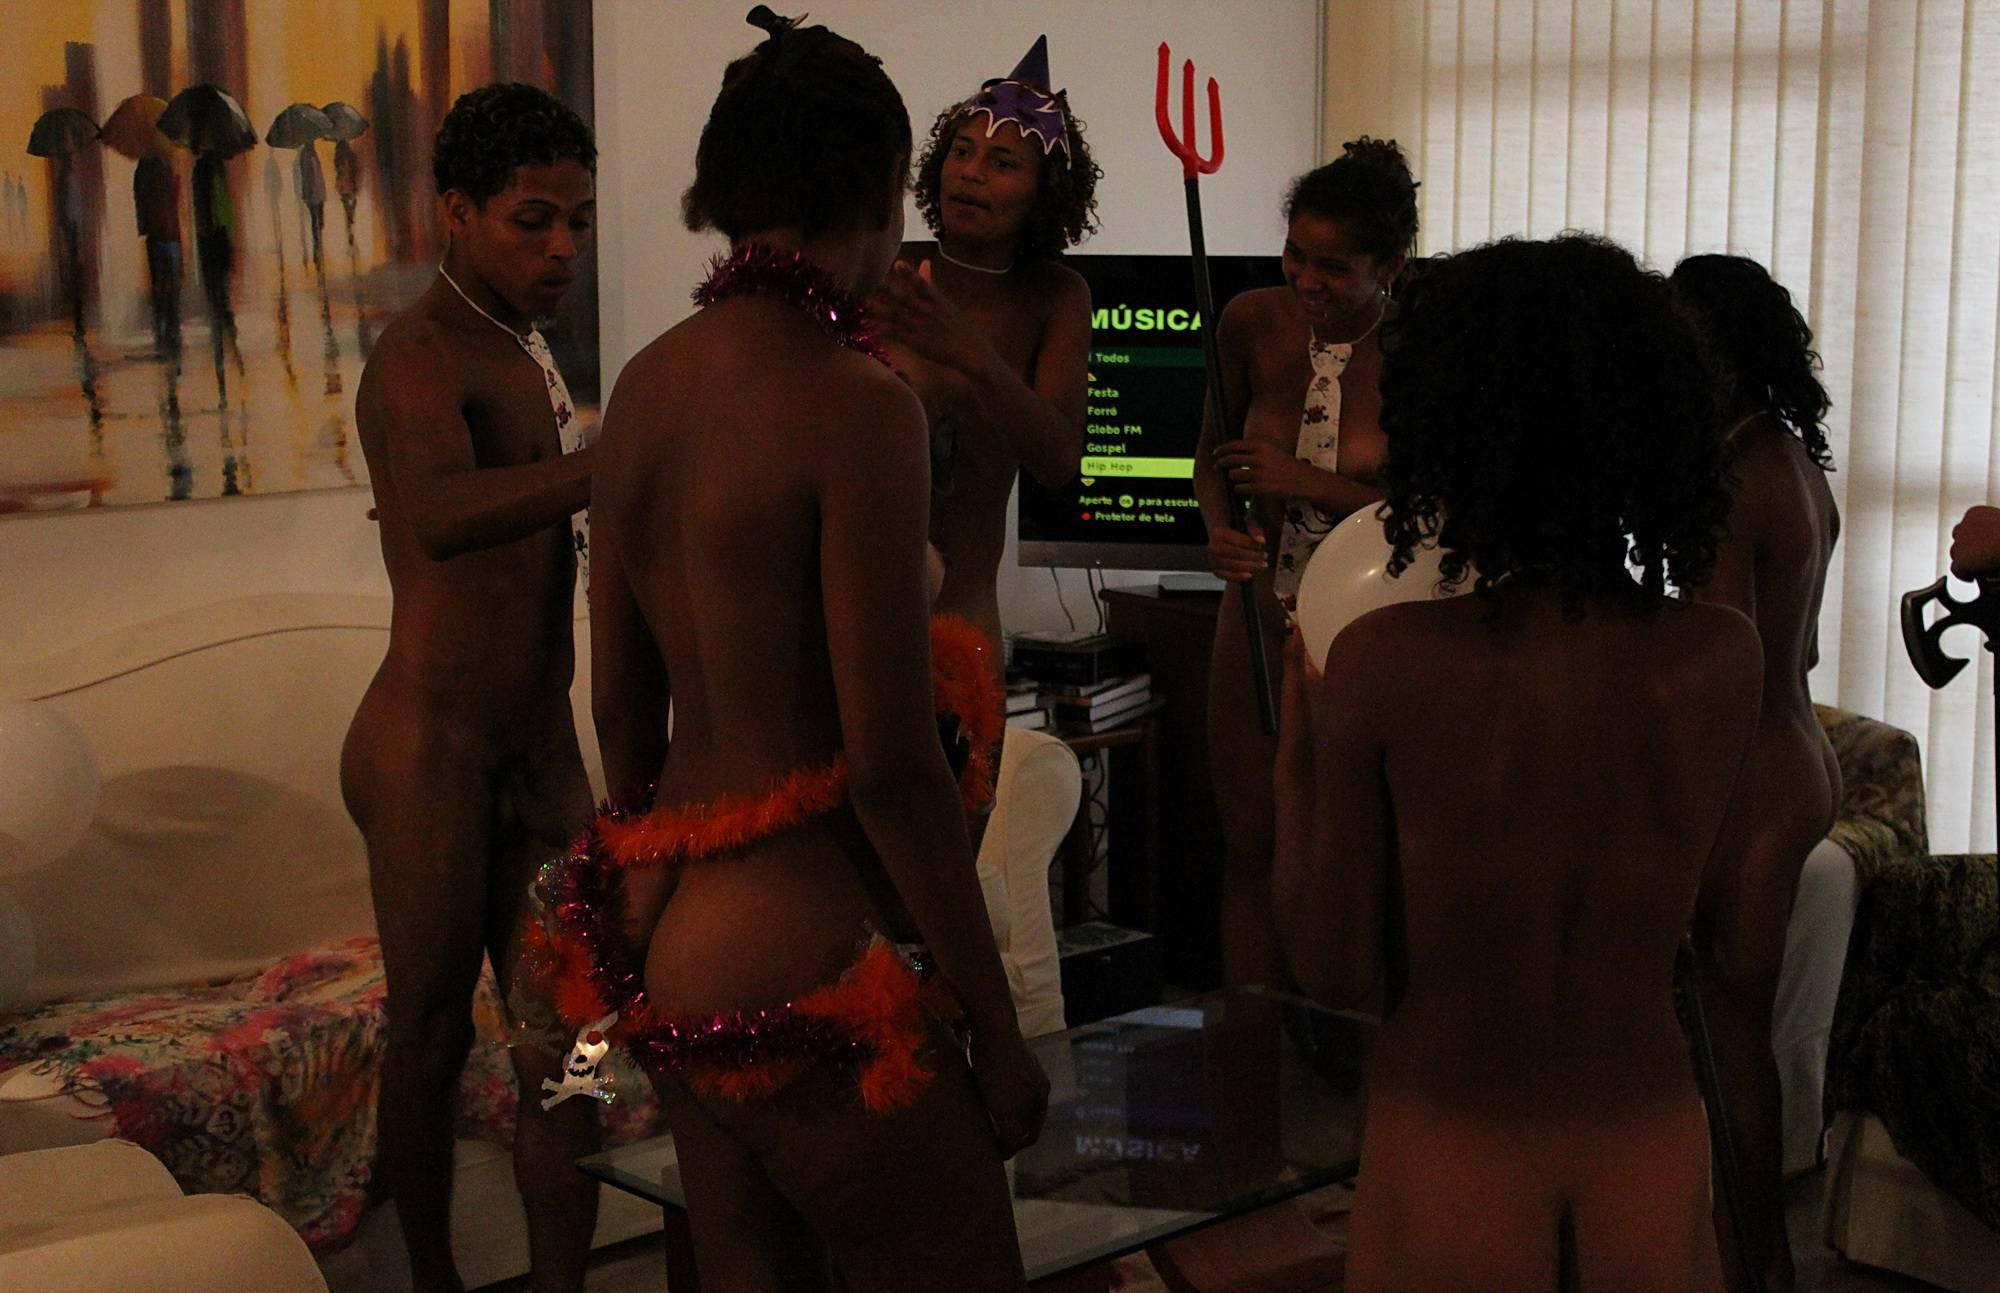 Nudist Pics Fun Apartment Activities - 2